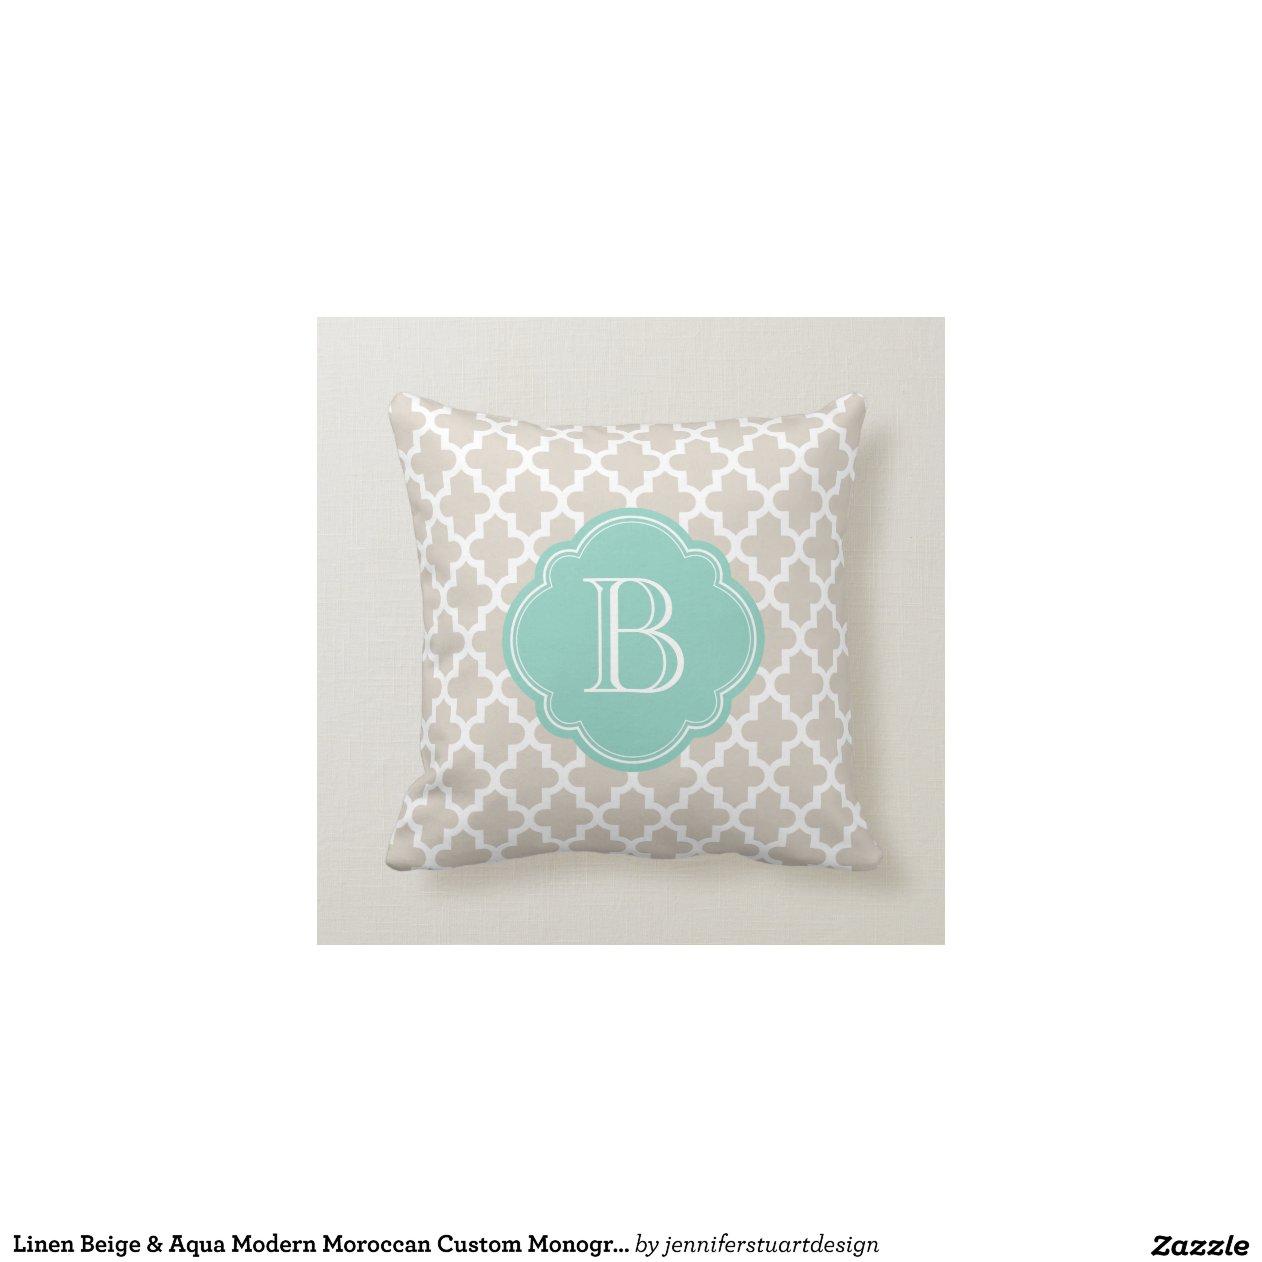 Linen Beige & Aqua Modern Moroccan Custom Monogram Pillow Zazzle